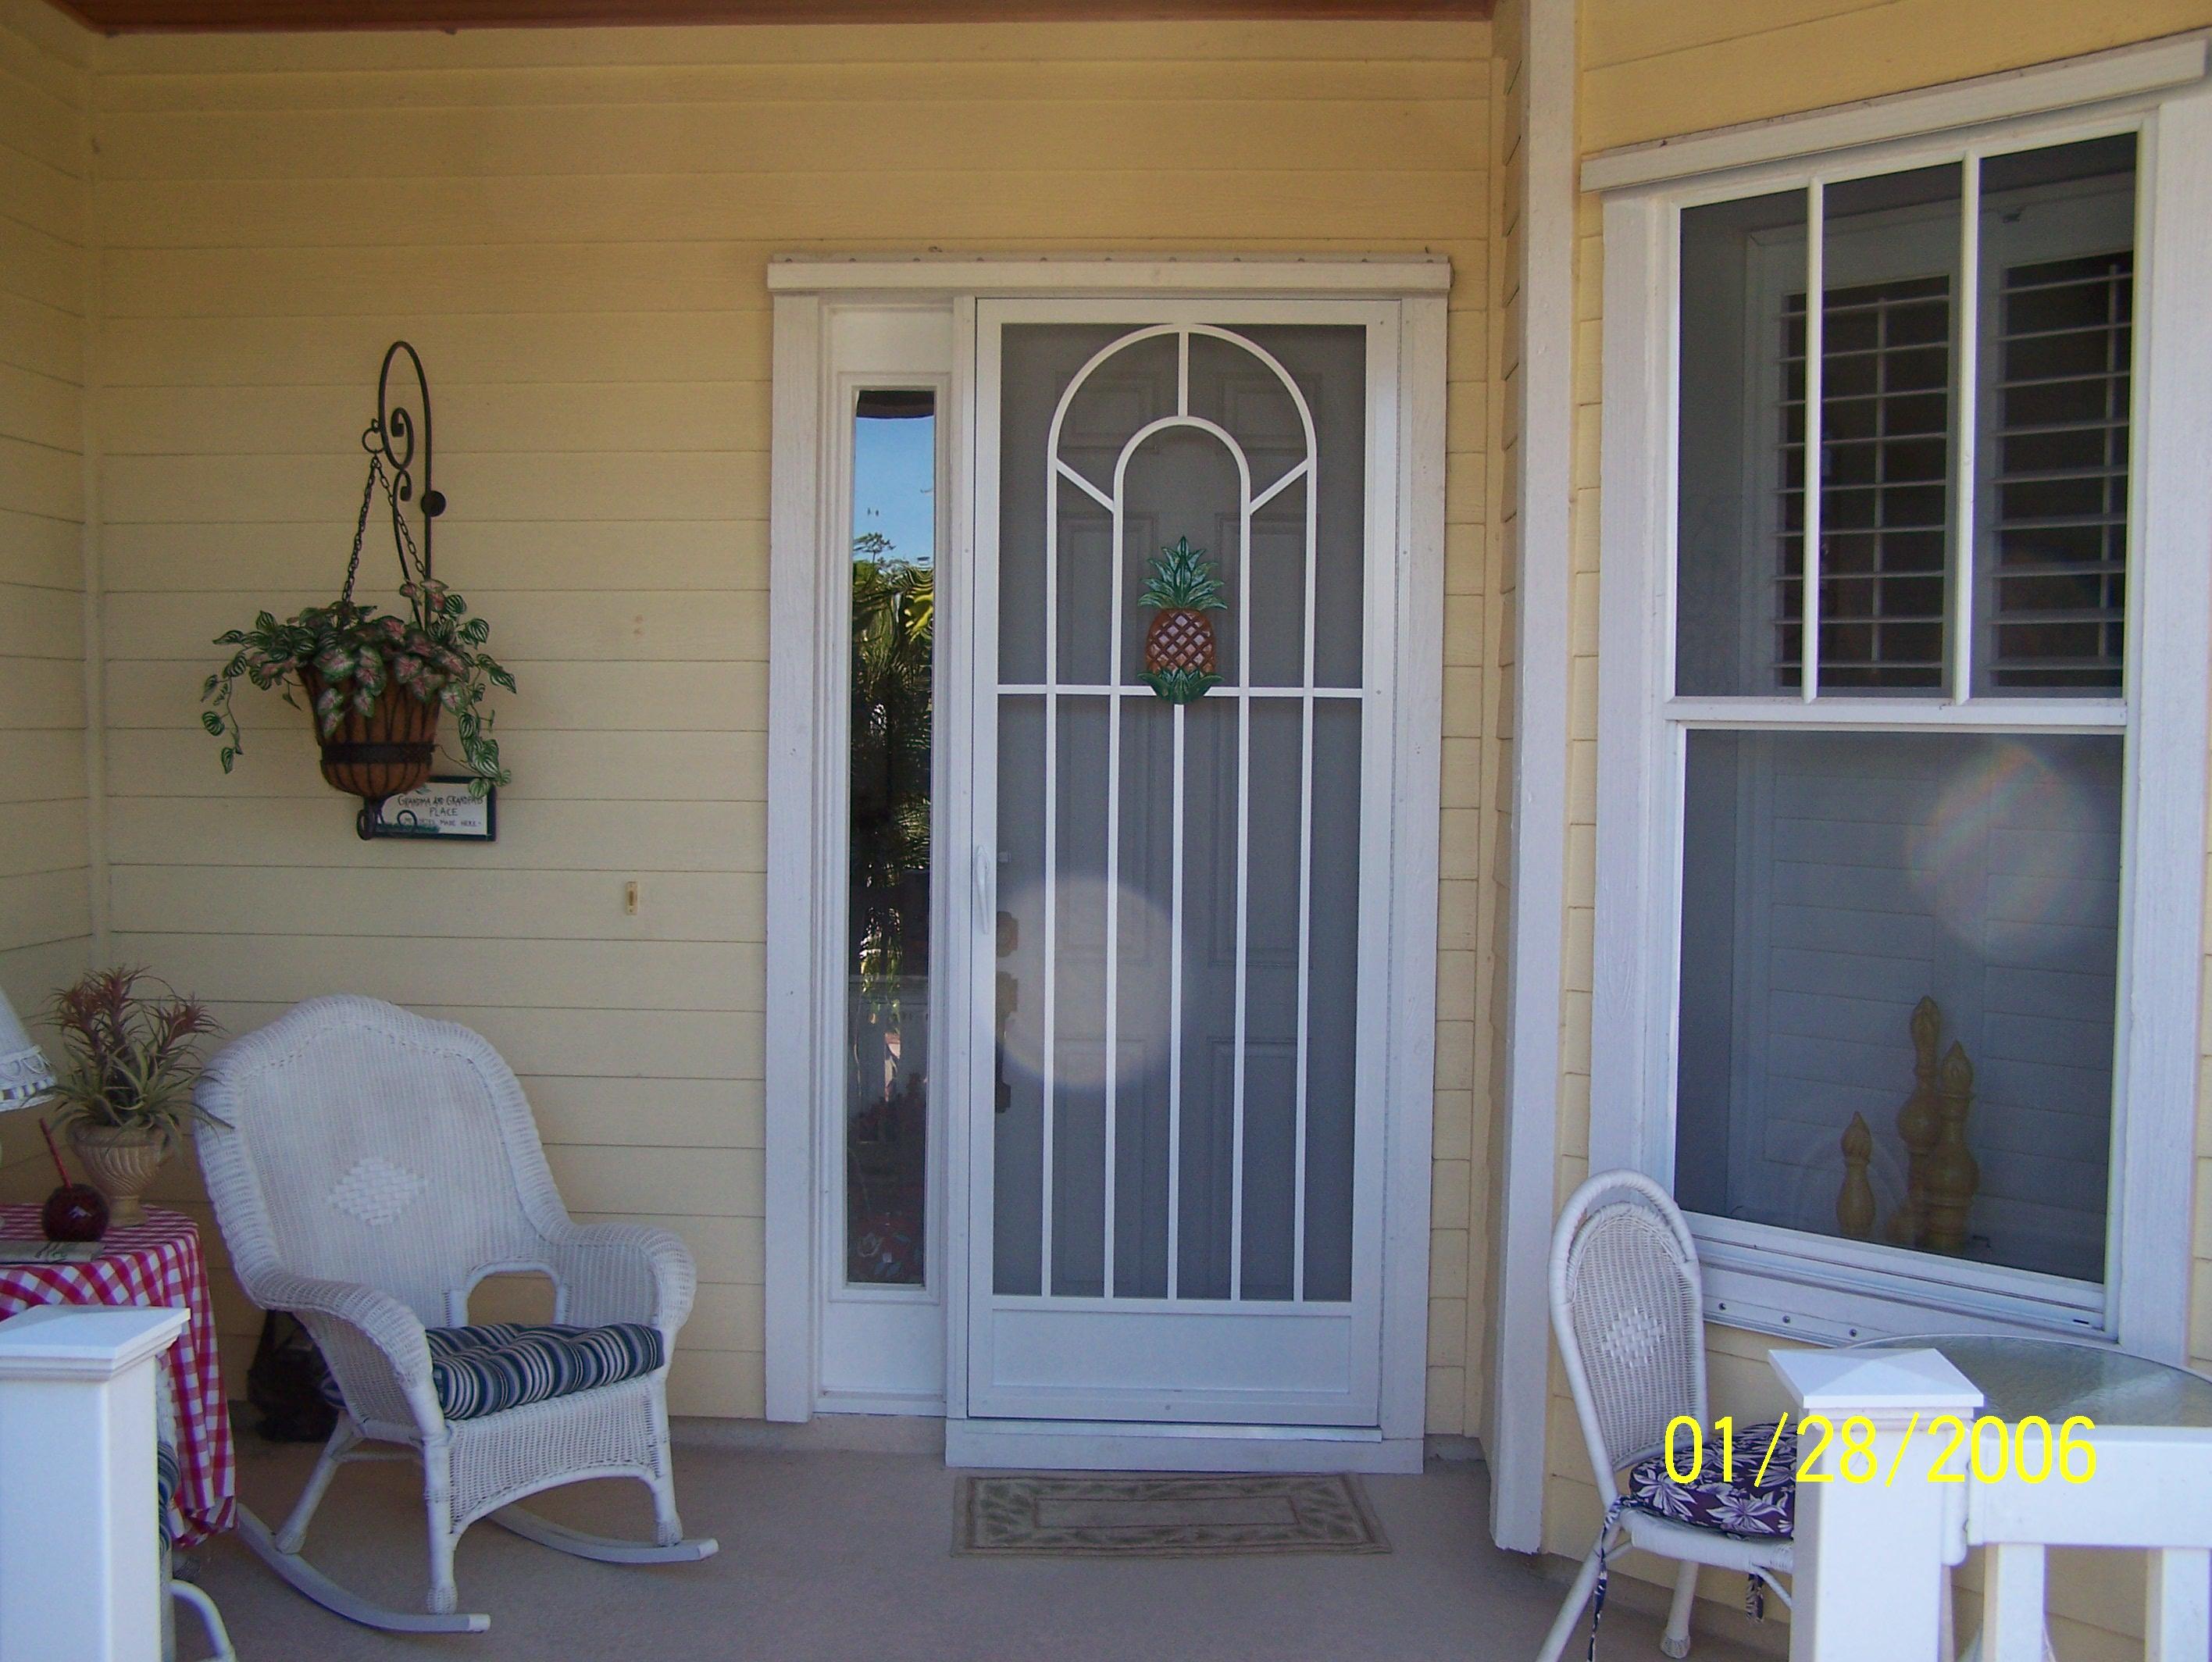 Screened Door with Pineapple Decoration